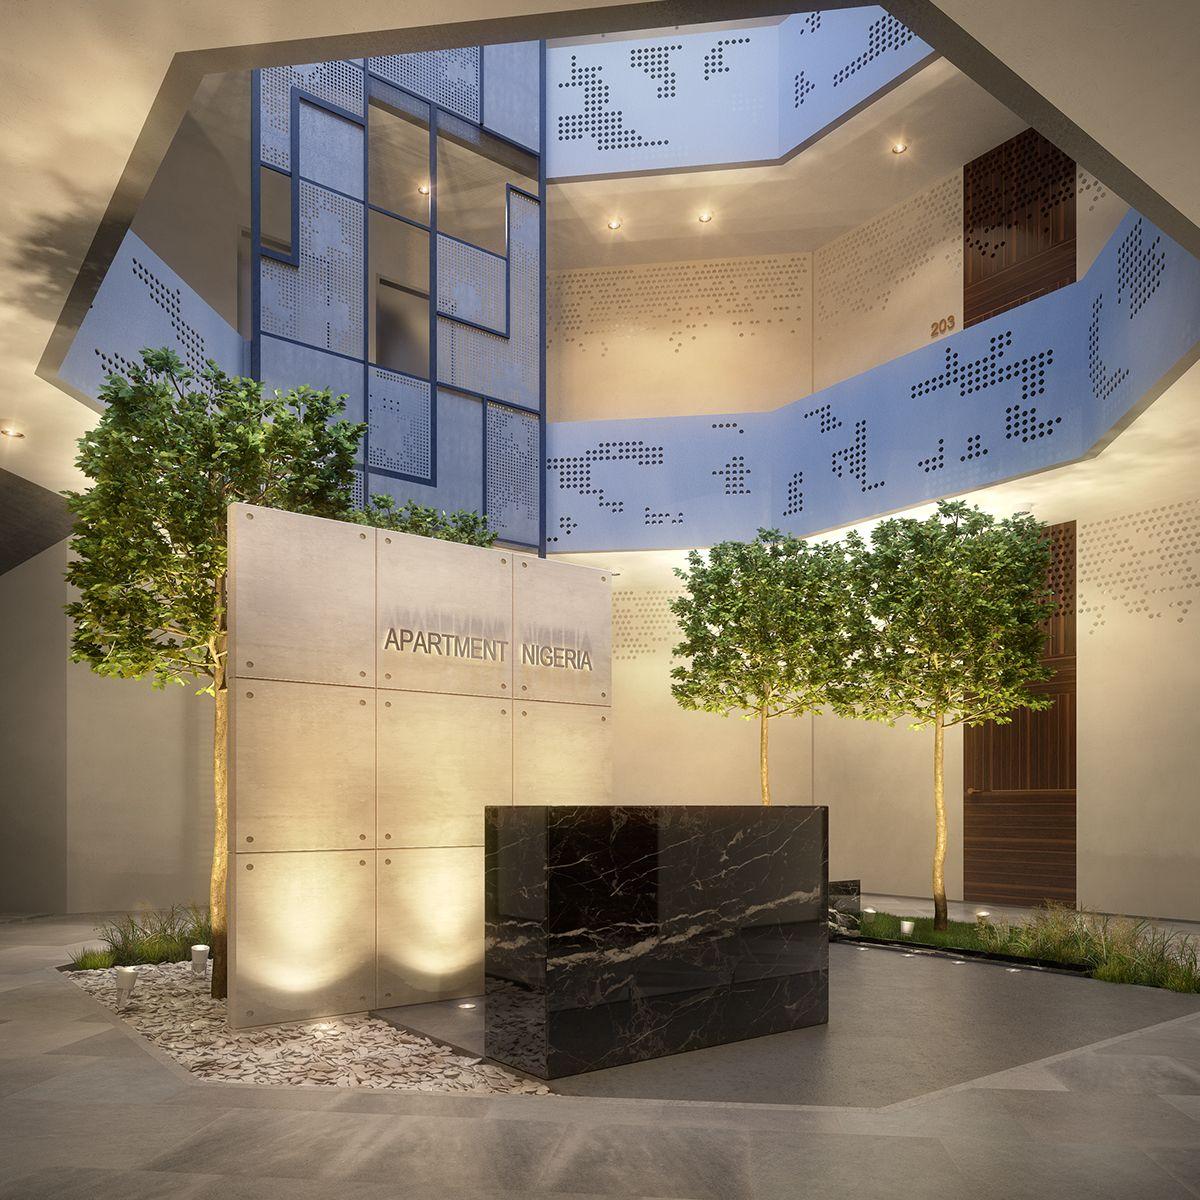 Luxury Apartment West Africa On Behance